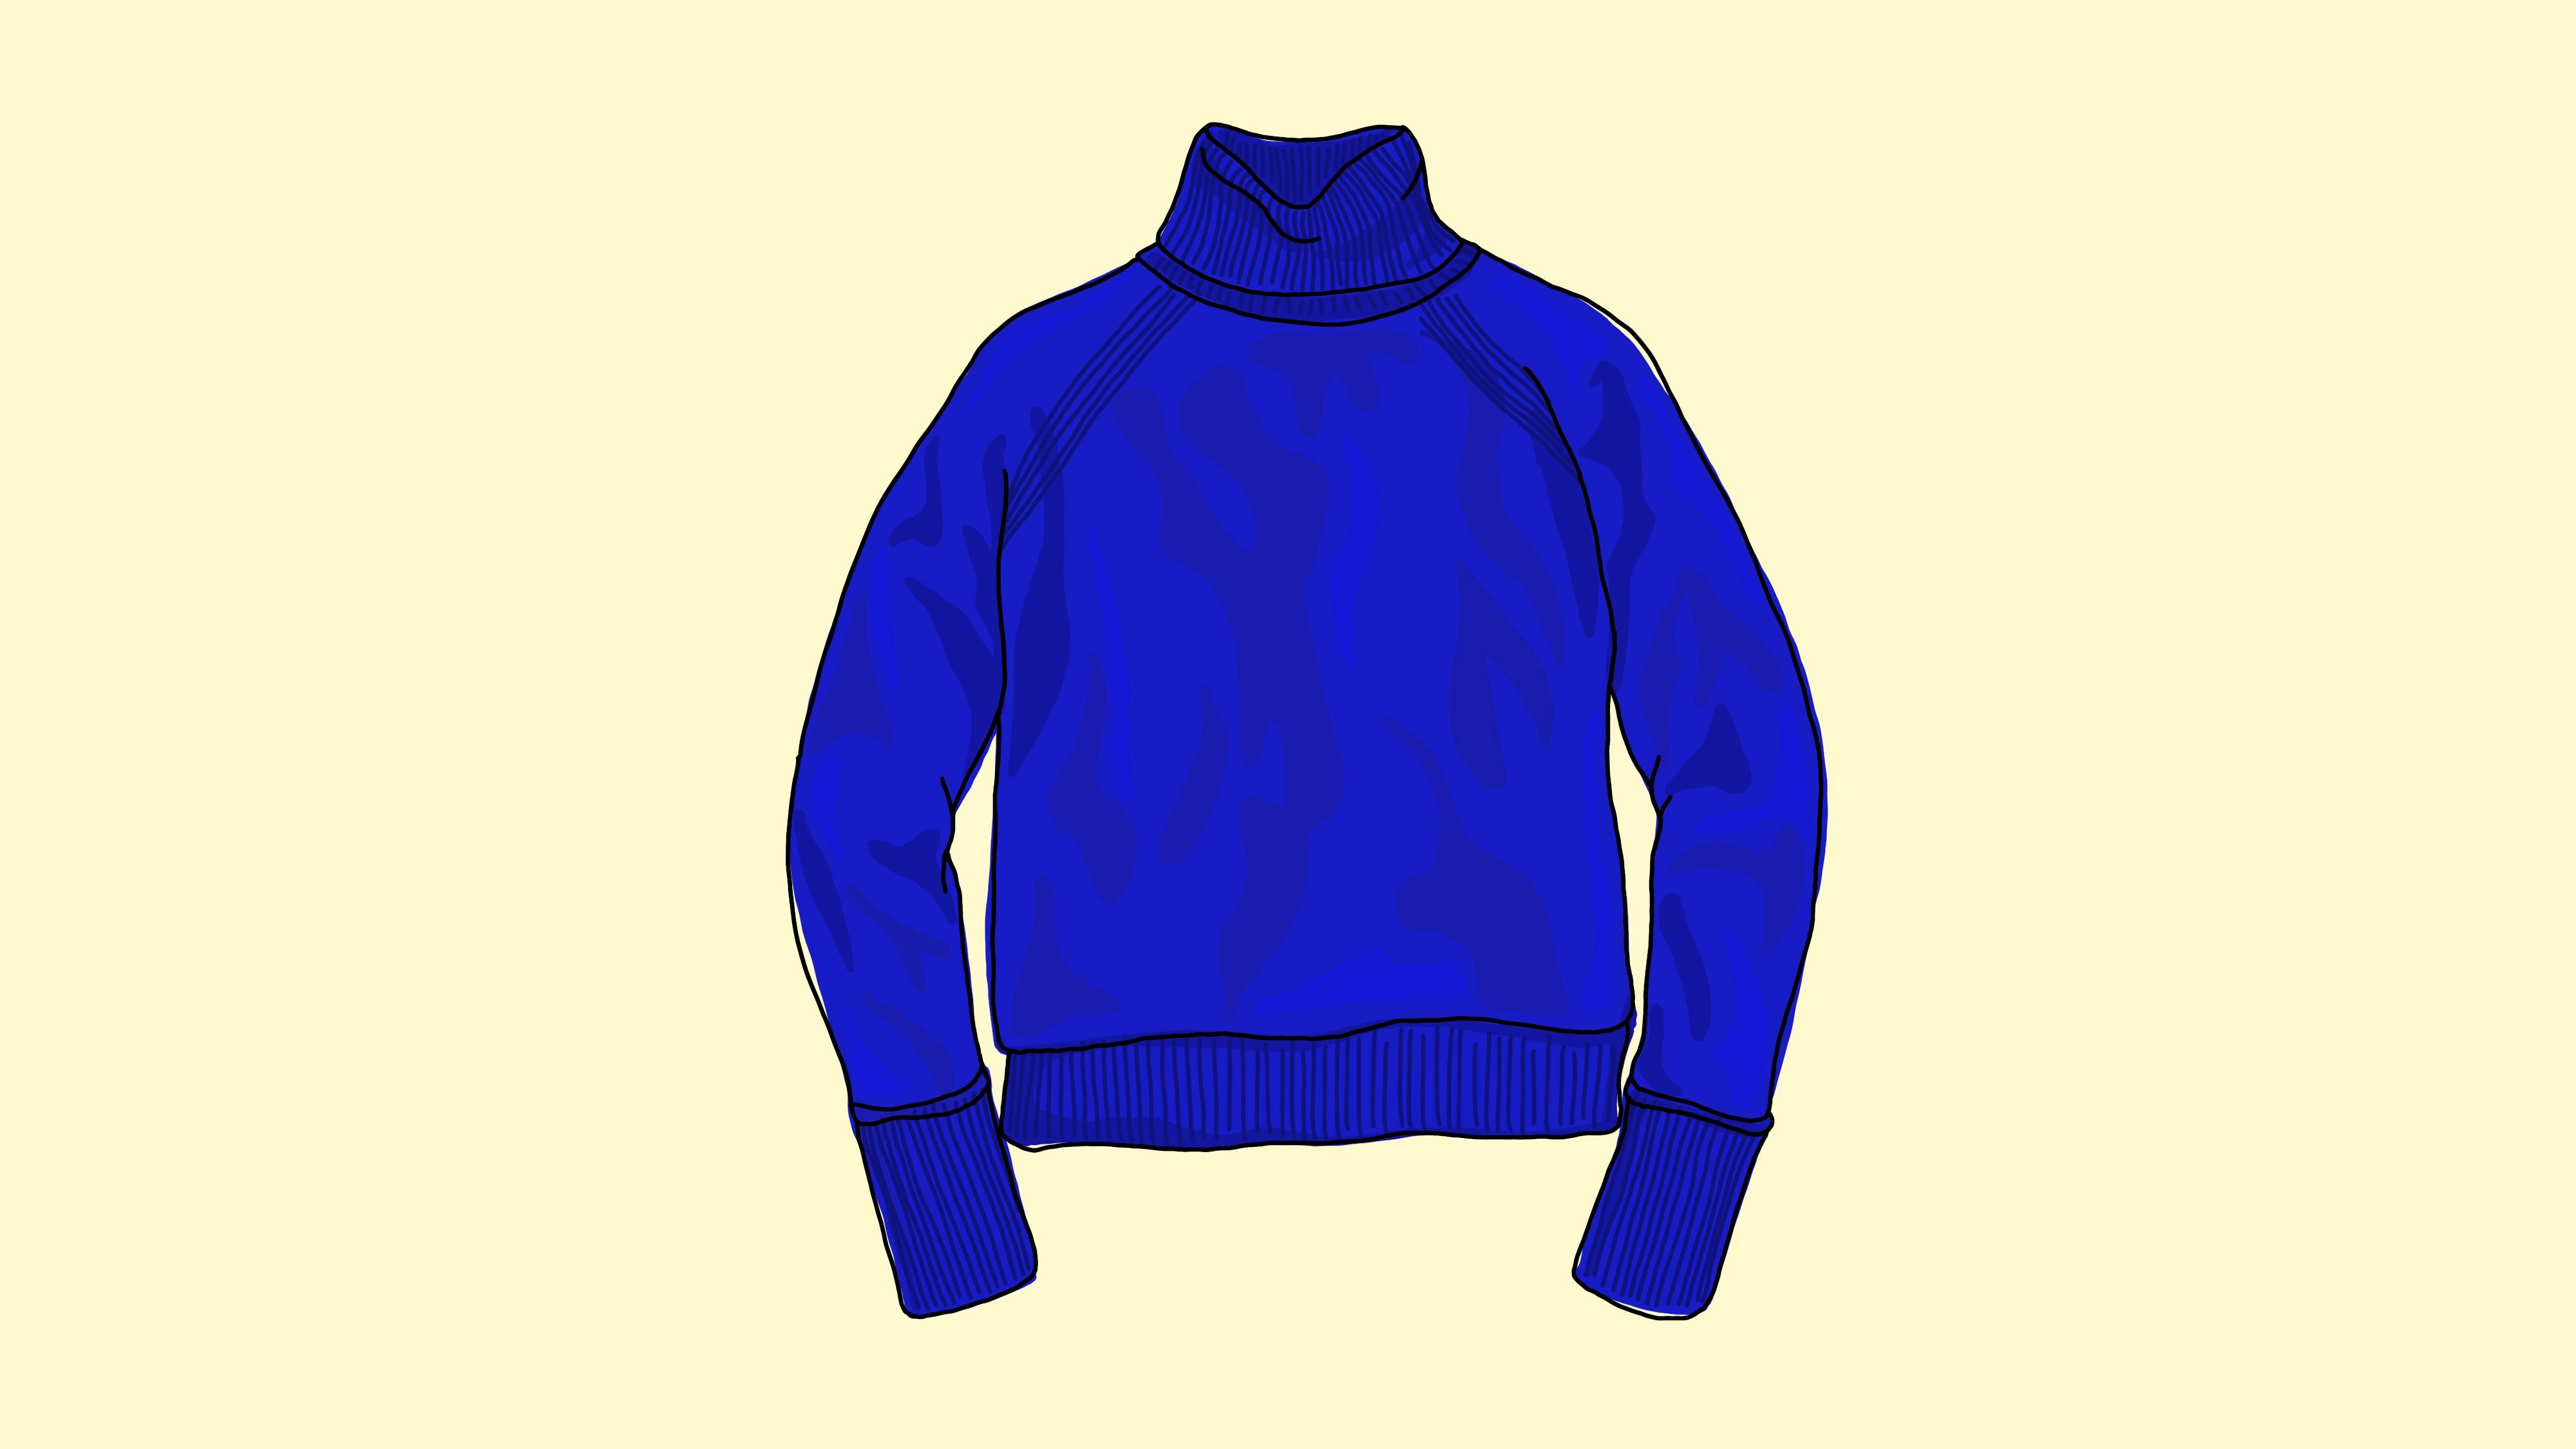 A blue sweater against a cream background.